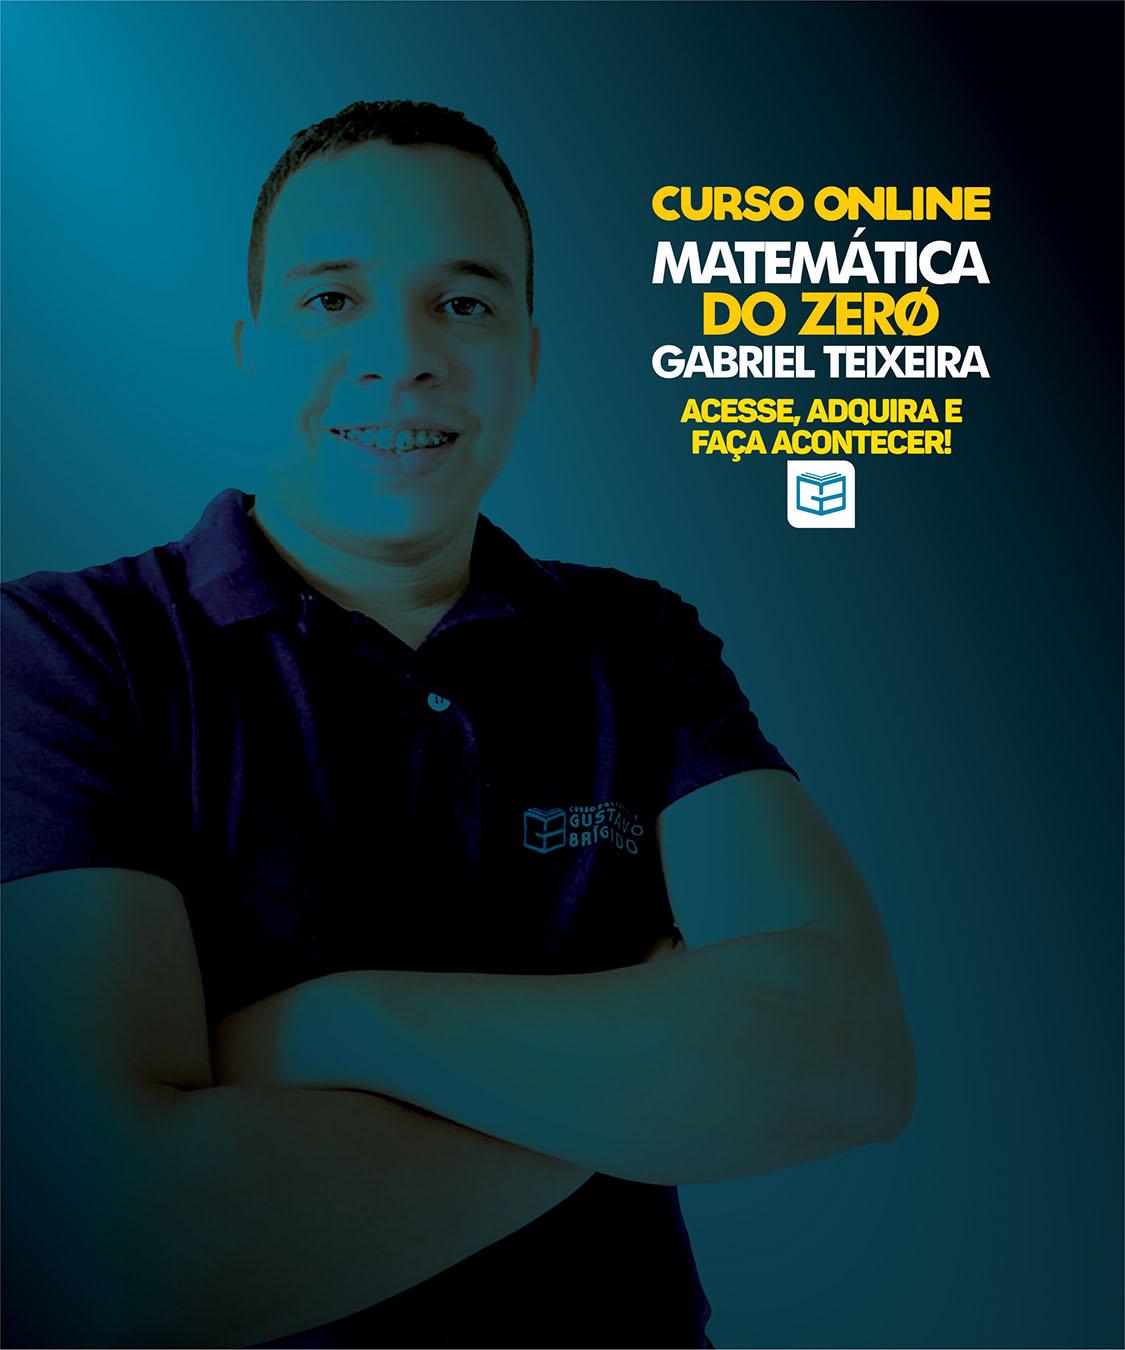 Matemática do Zero - Professor Gabriel Teixeira